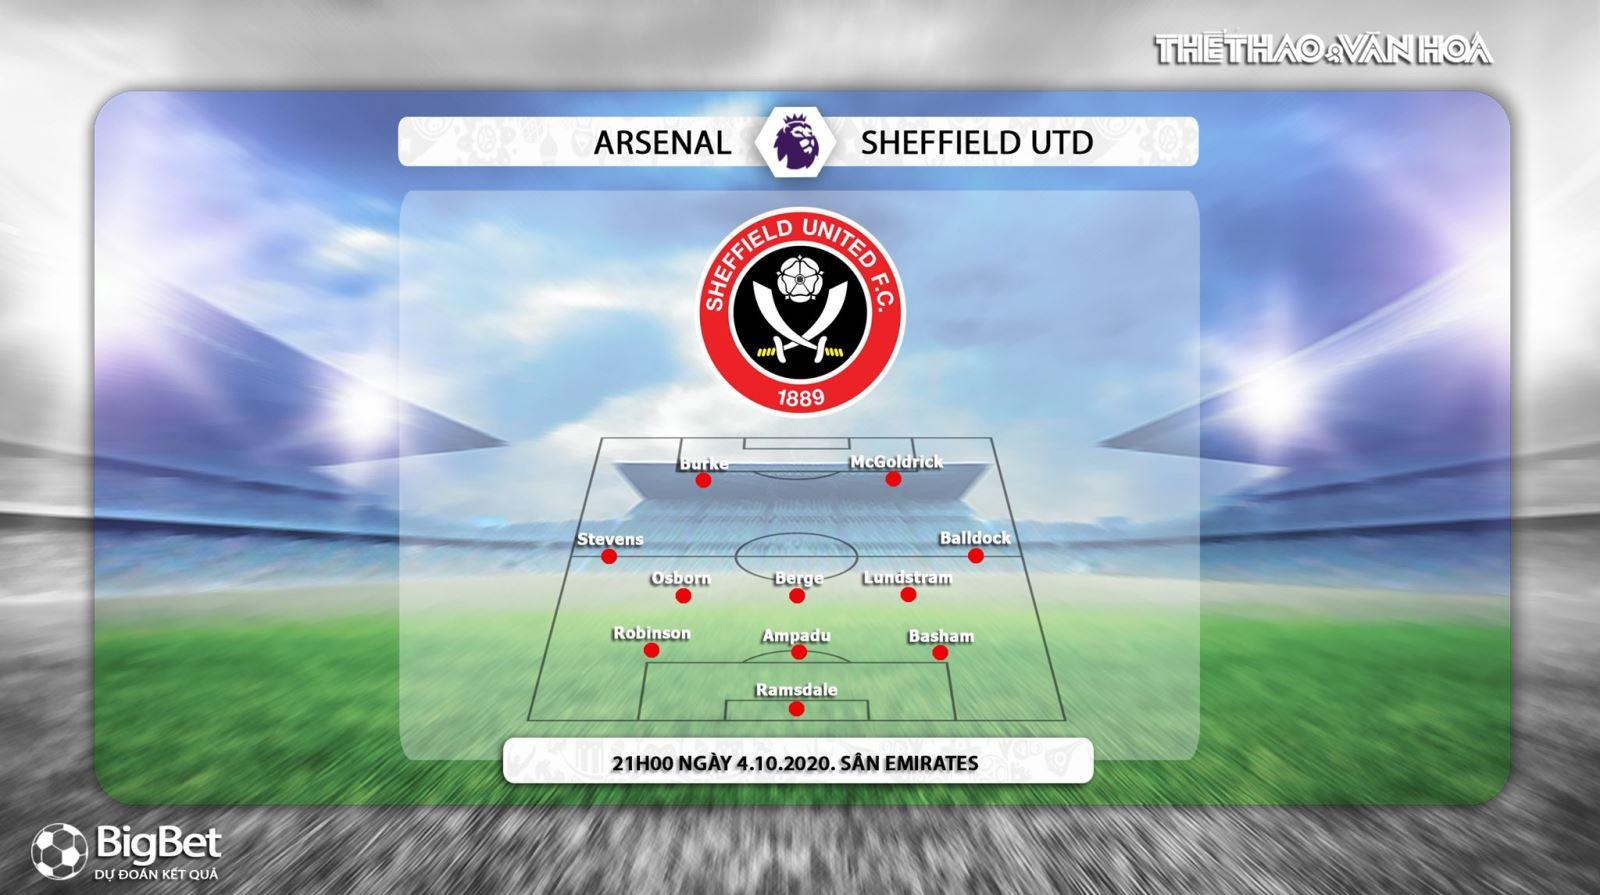 Soi kèo Arsenal vsSheffield Utd, Arsenal vsSheffield Utd, Arsenal, Sheffield, soi kèo bóng đá, kèo bóng đá, soi kèo, trực tiếp Arsenal vsSheffield Utd